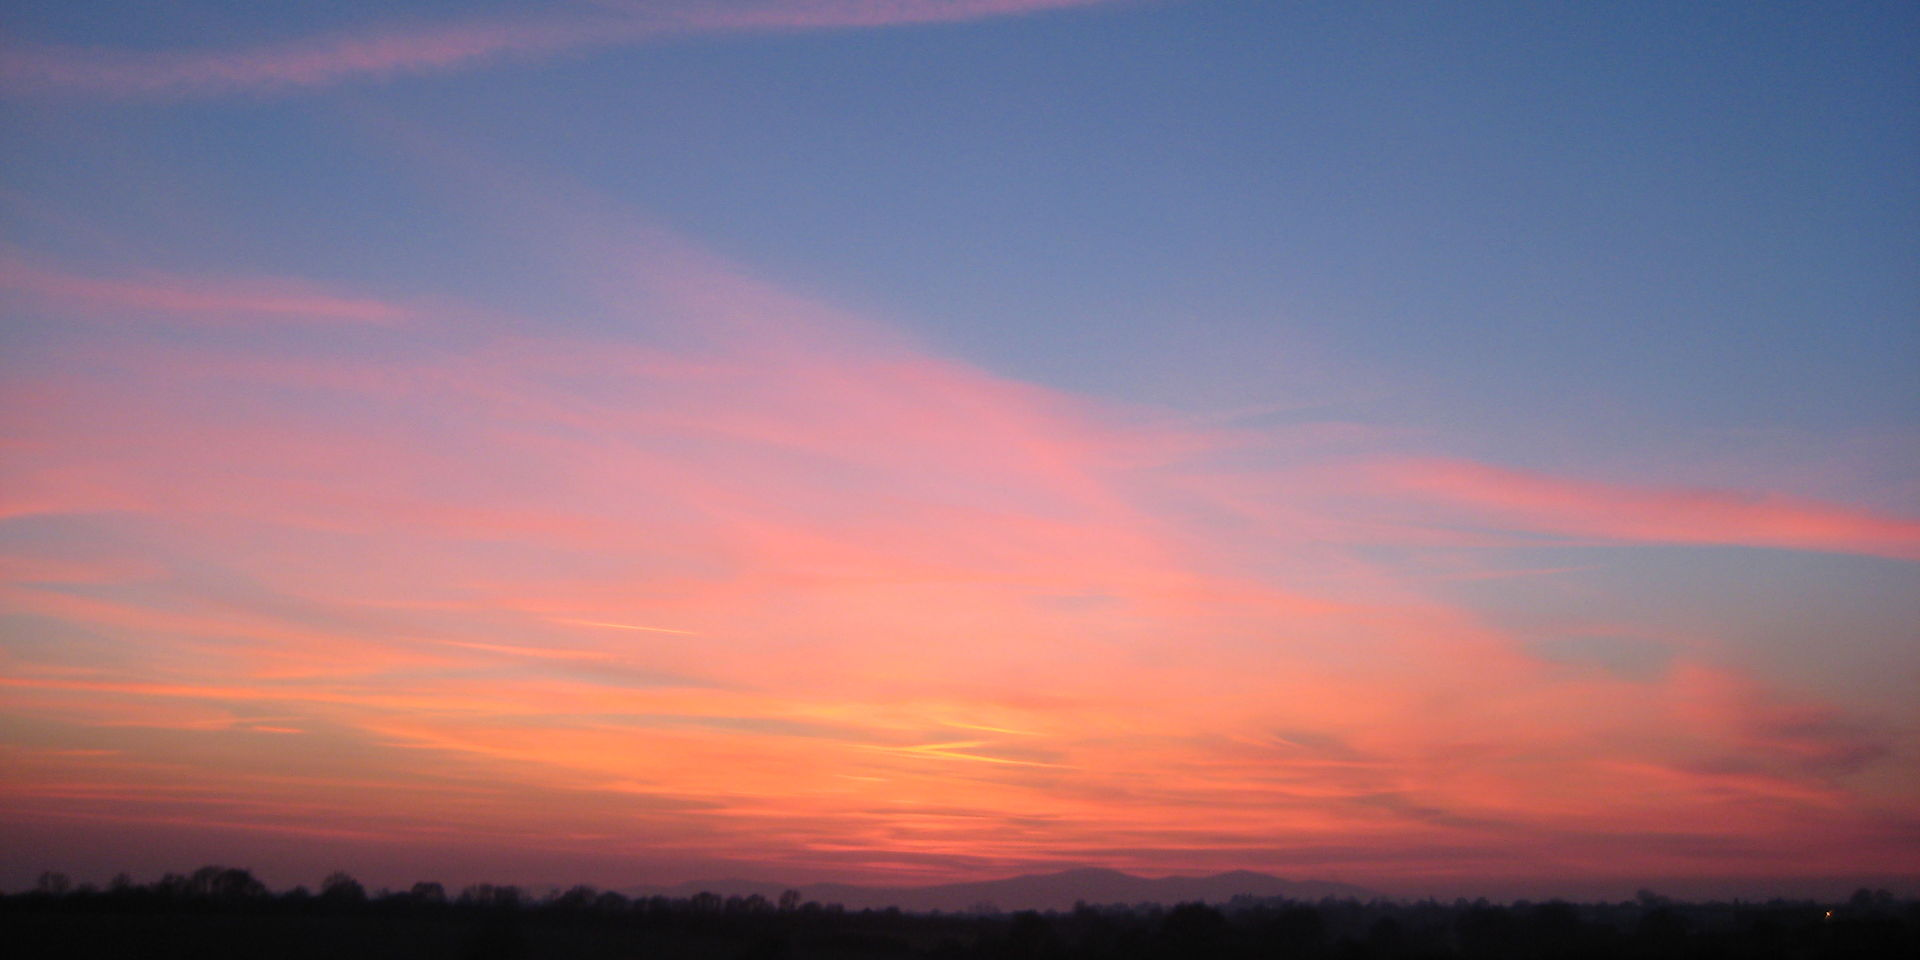 Sunset over the Malverns